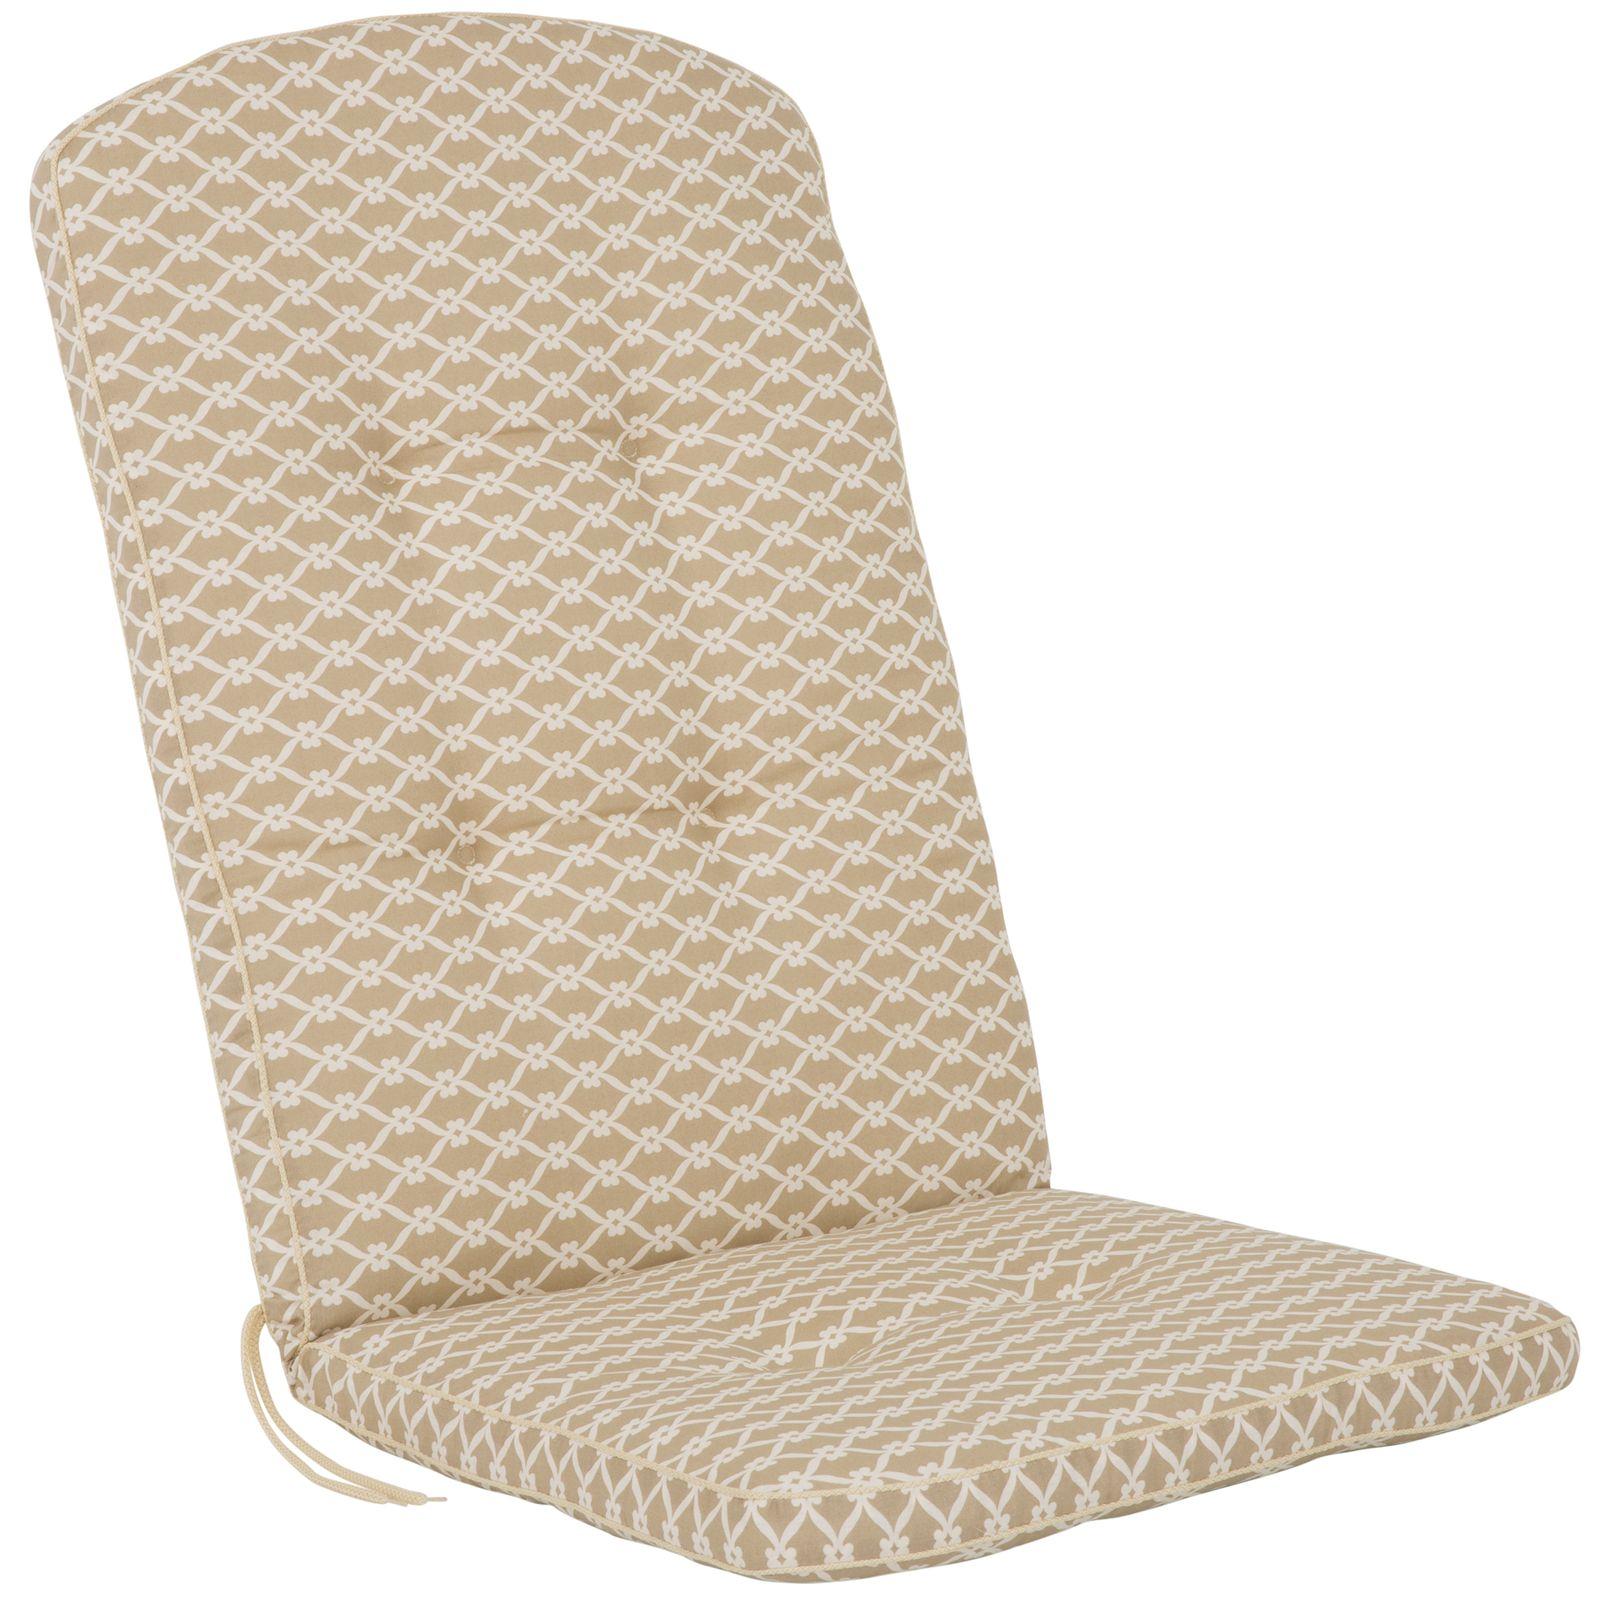 Poduszka na krzesło Szafir H031-05PB PATIO